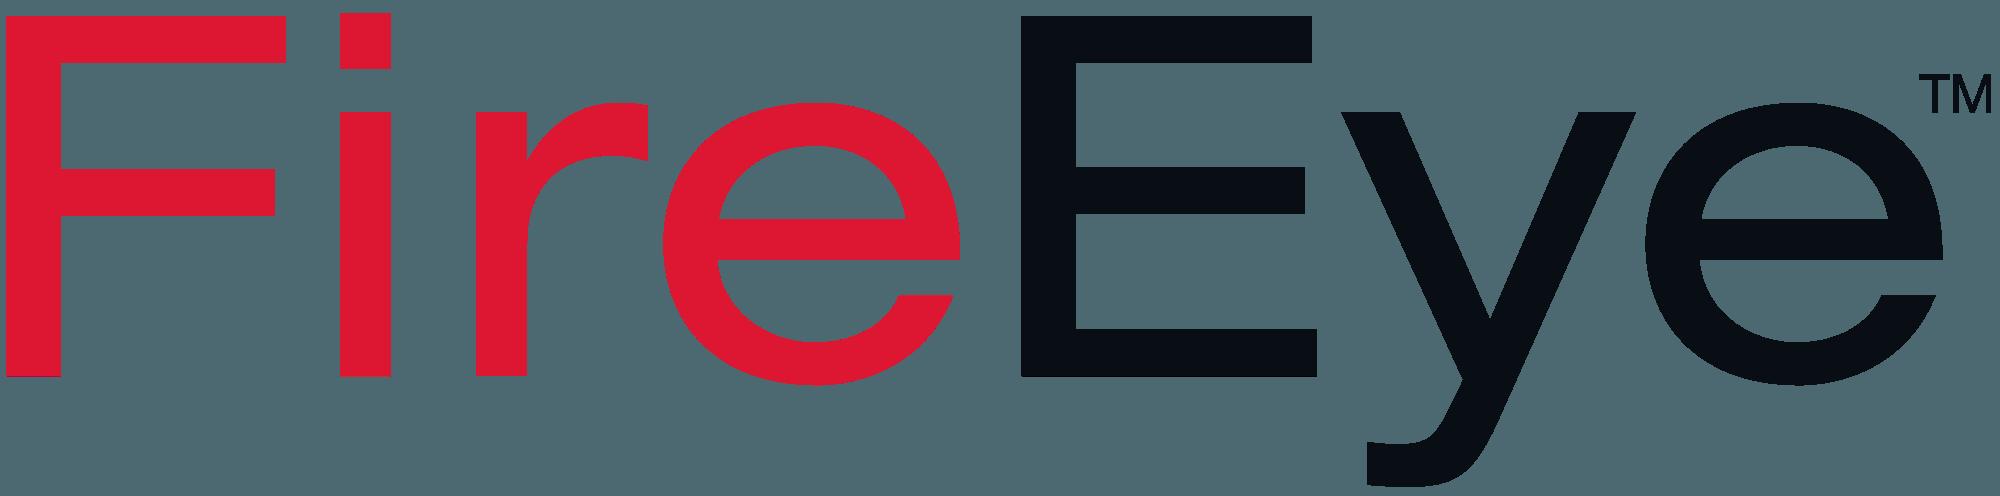 FireEye Logo - LogoDix